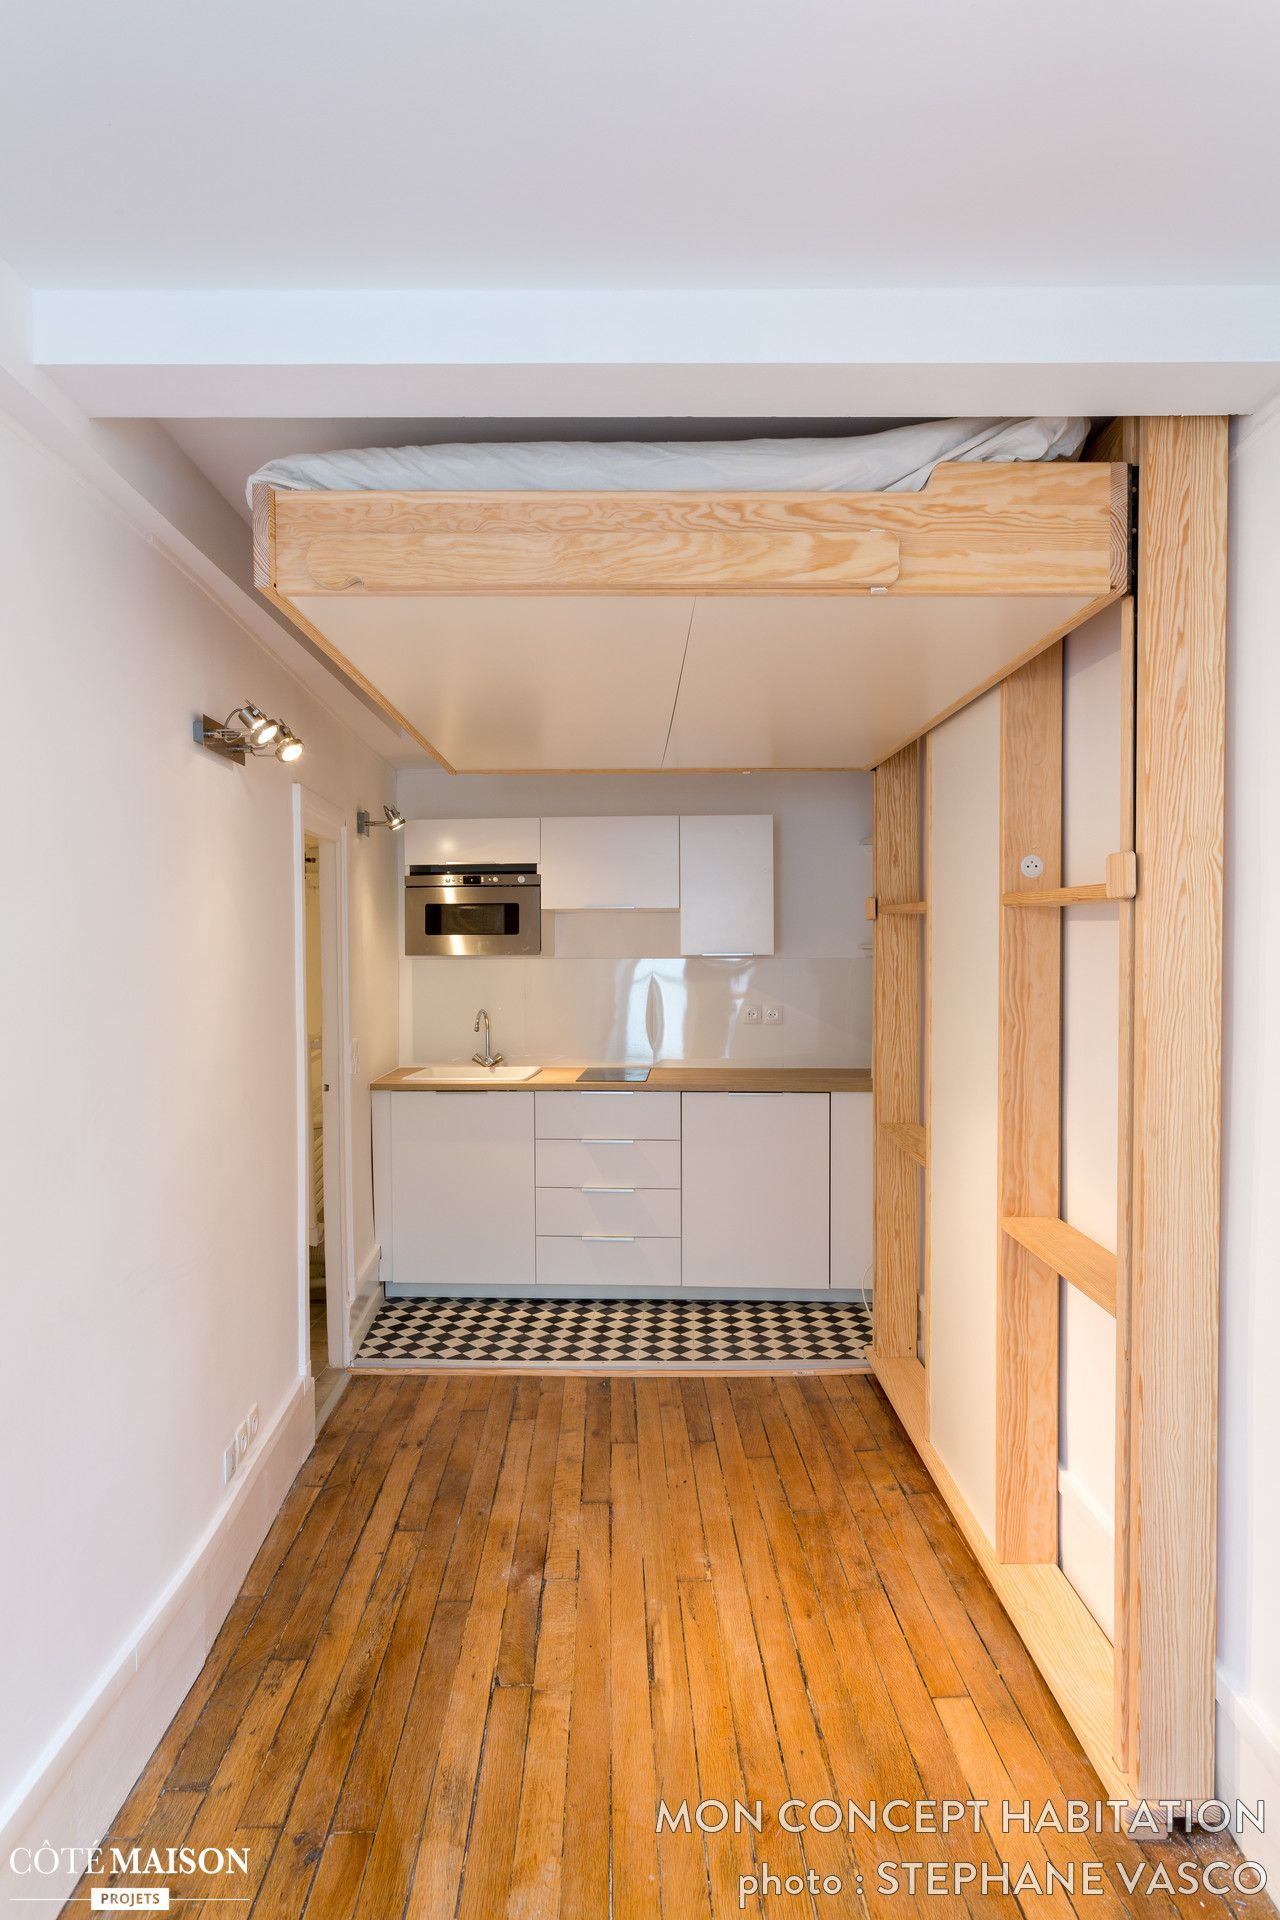 lit suspendu et mini cuisine dans un 14m2 studio petit. Black Bedroom Furniture Sets. Home Design Ideas